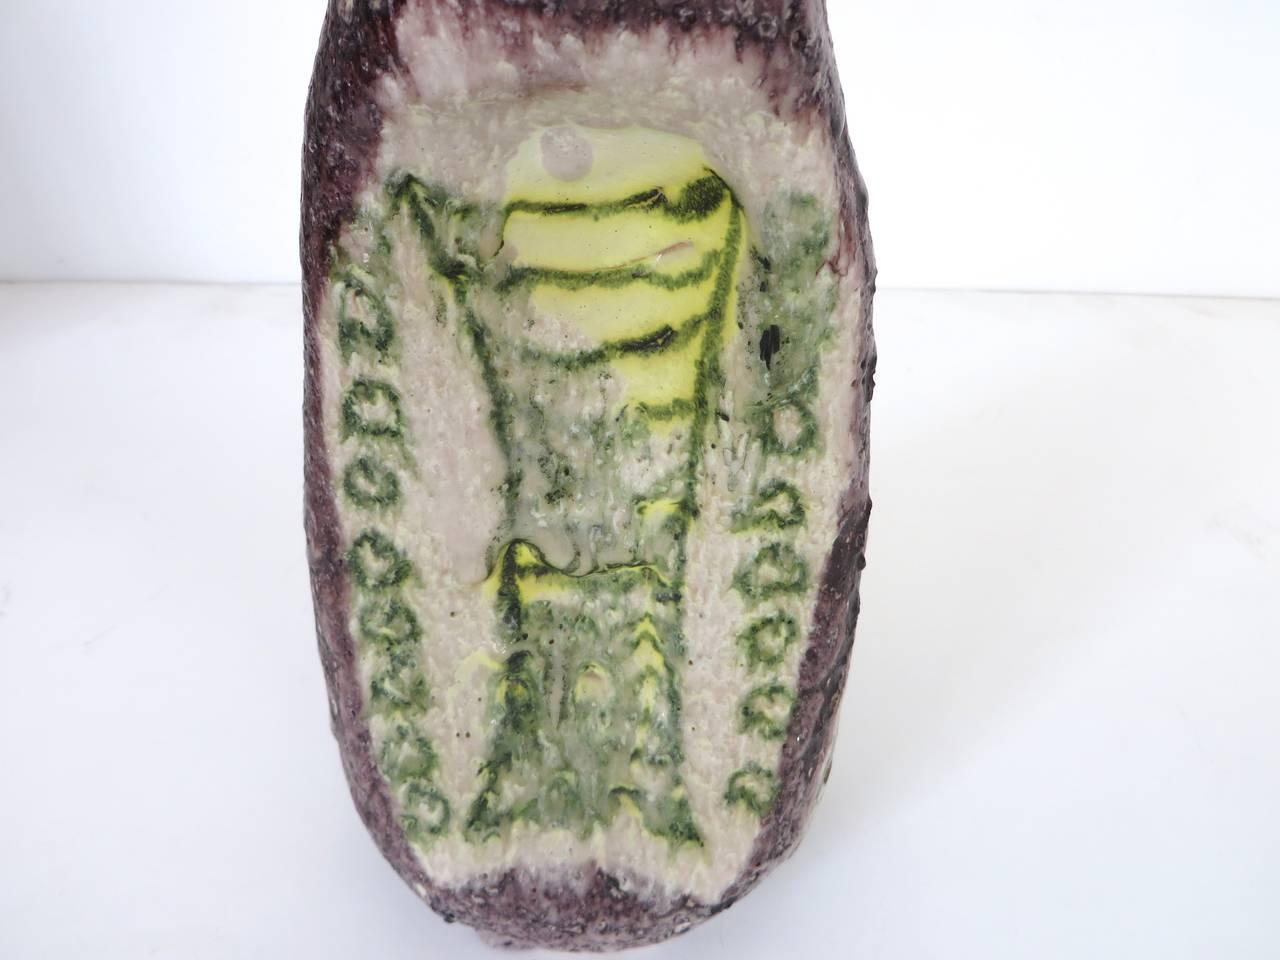 Italian Ceramic Pitcher by Guido Gambone 8